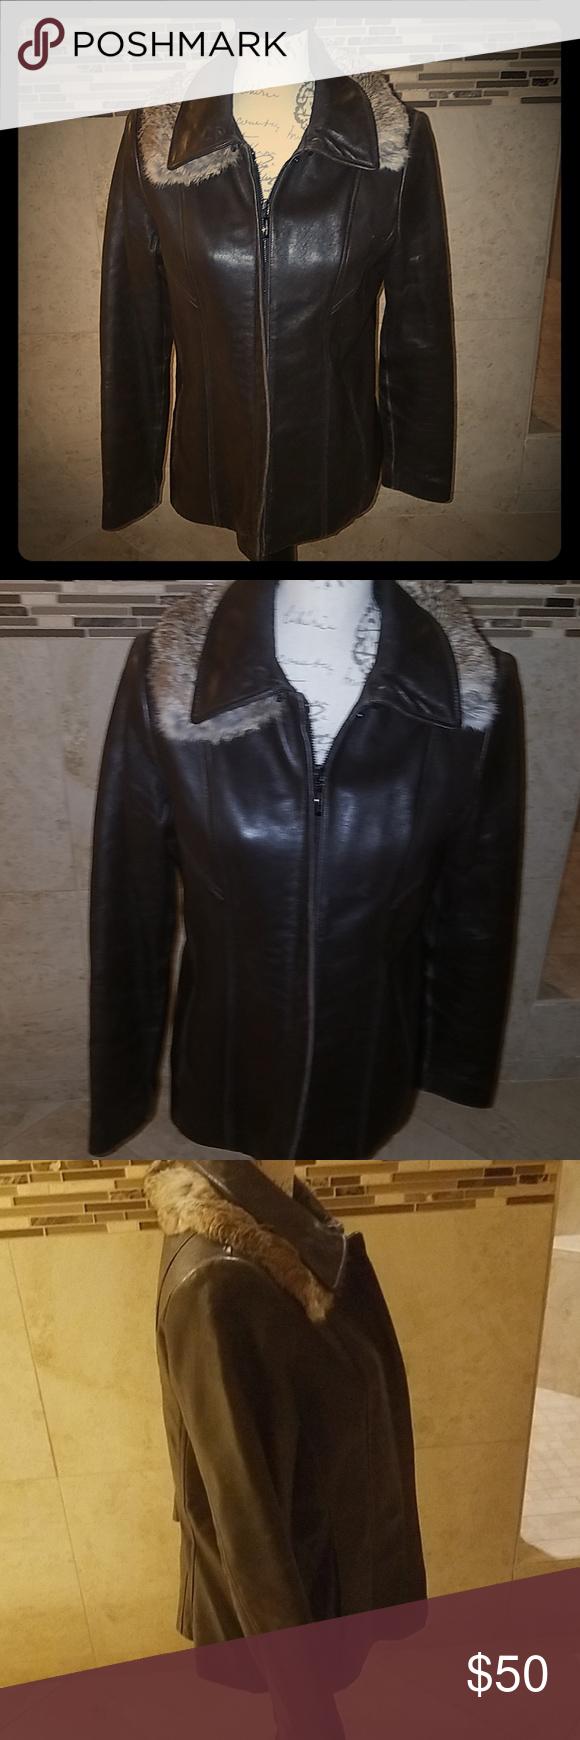 Jones New York Leather Jacket With Fur Collar Fur Leather Jacket Leather Jacket Clothes Design